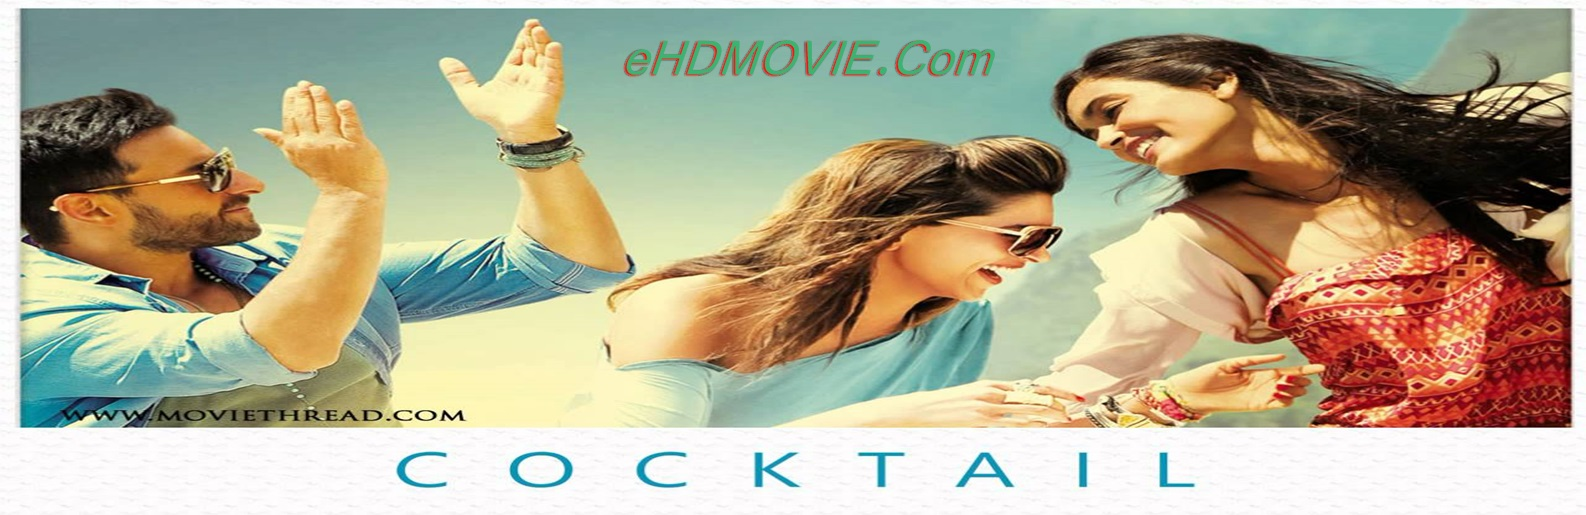 Cocktail 2012 Full Movie Hindi 720p - 480p ORG BRRip 500MB - 1.1GB ESubs Free Download